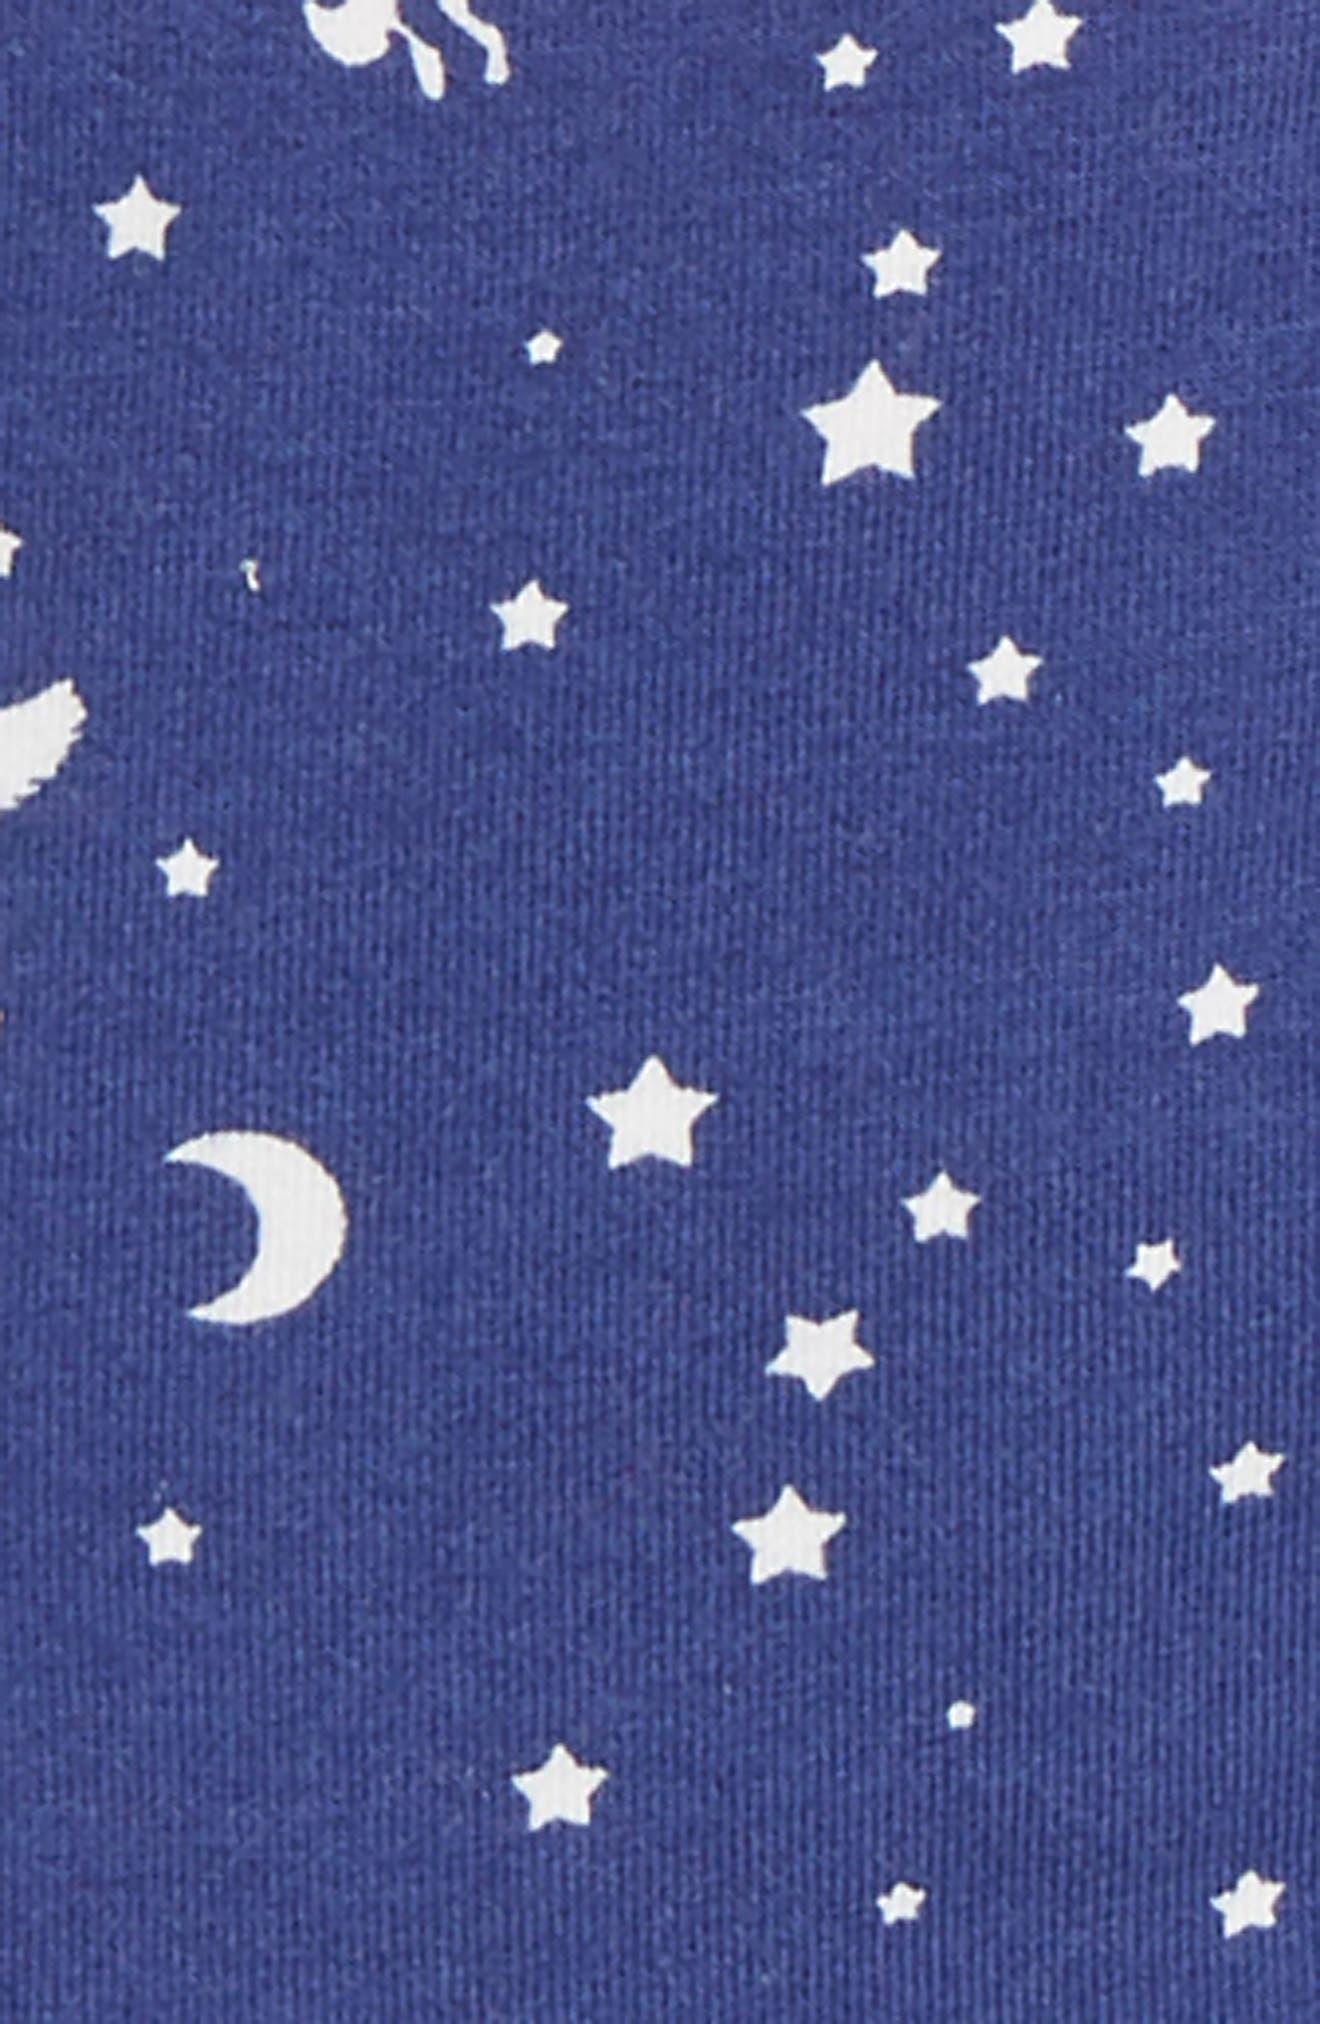 3-Pack Underwear,                             Alternate thumbnail 2, color,                             BLU UNICORN SKY